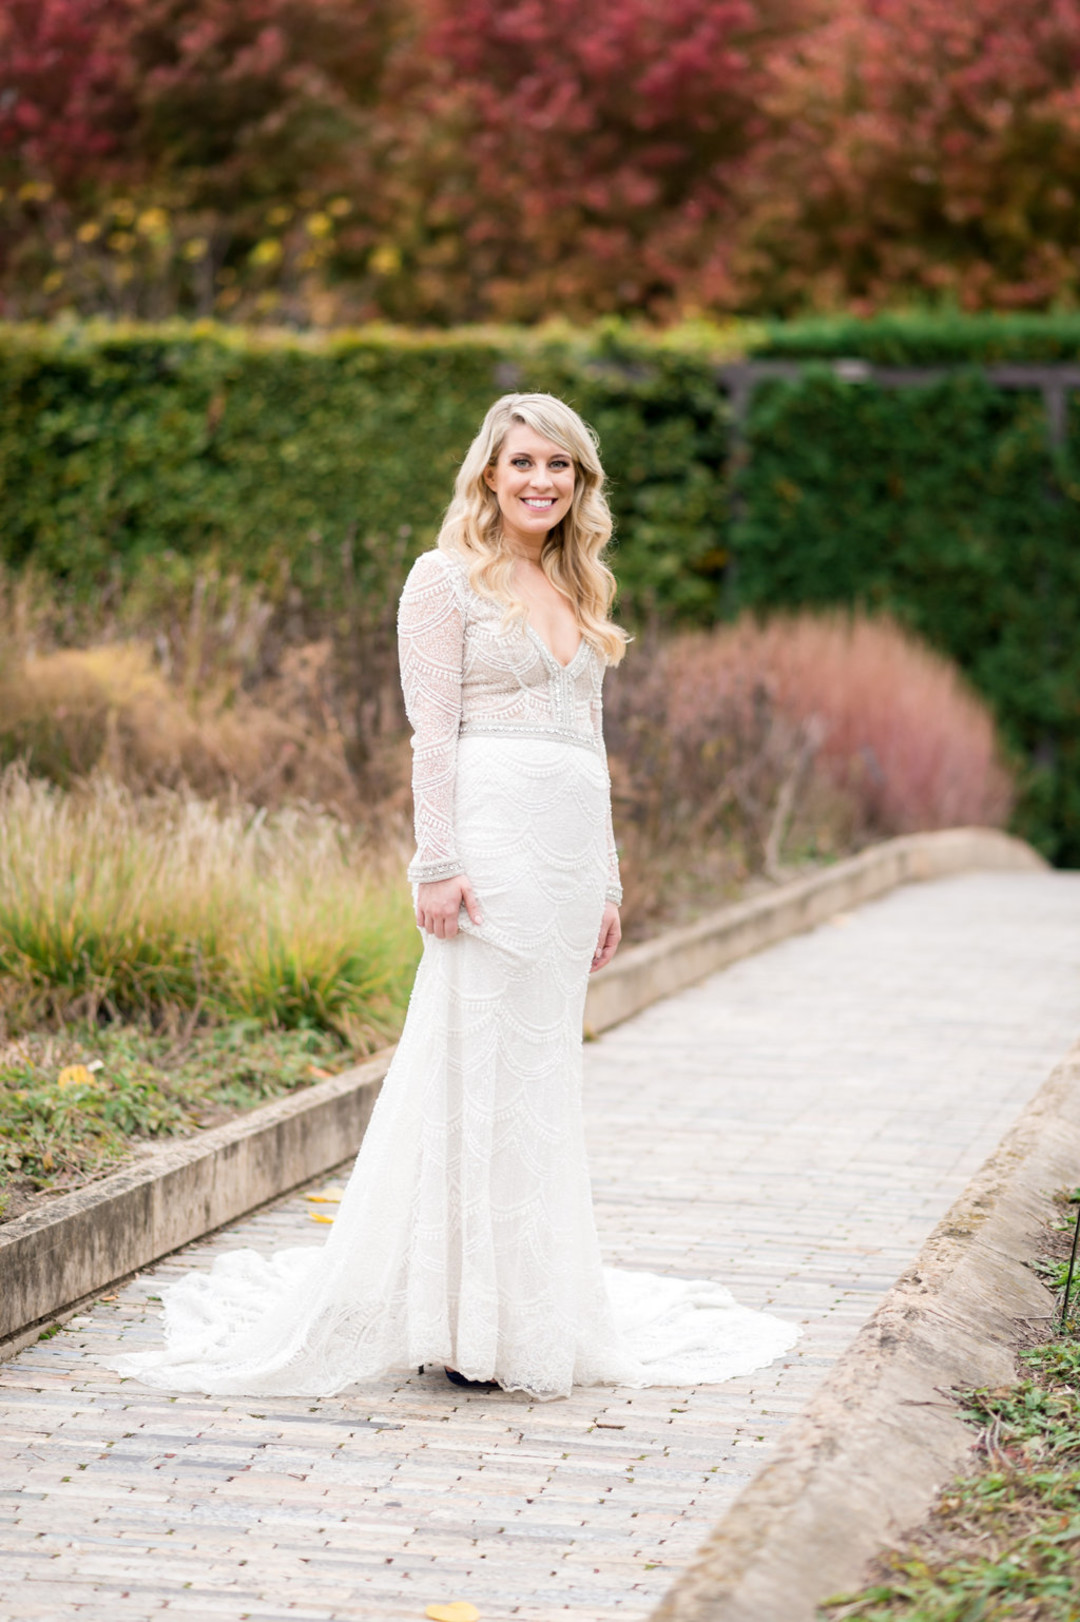 Long Sleeve Lace Elegant Bridal Gown Chicago Wedding Julia Franzosa Photography